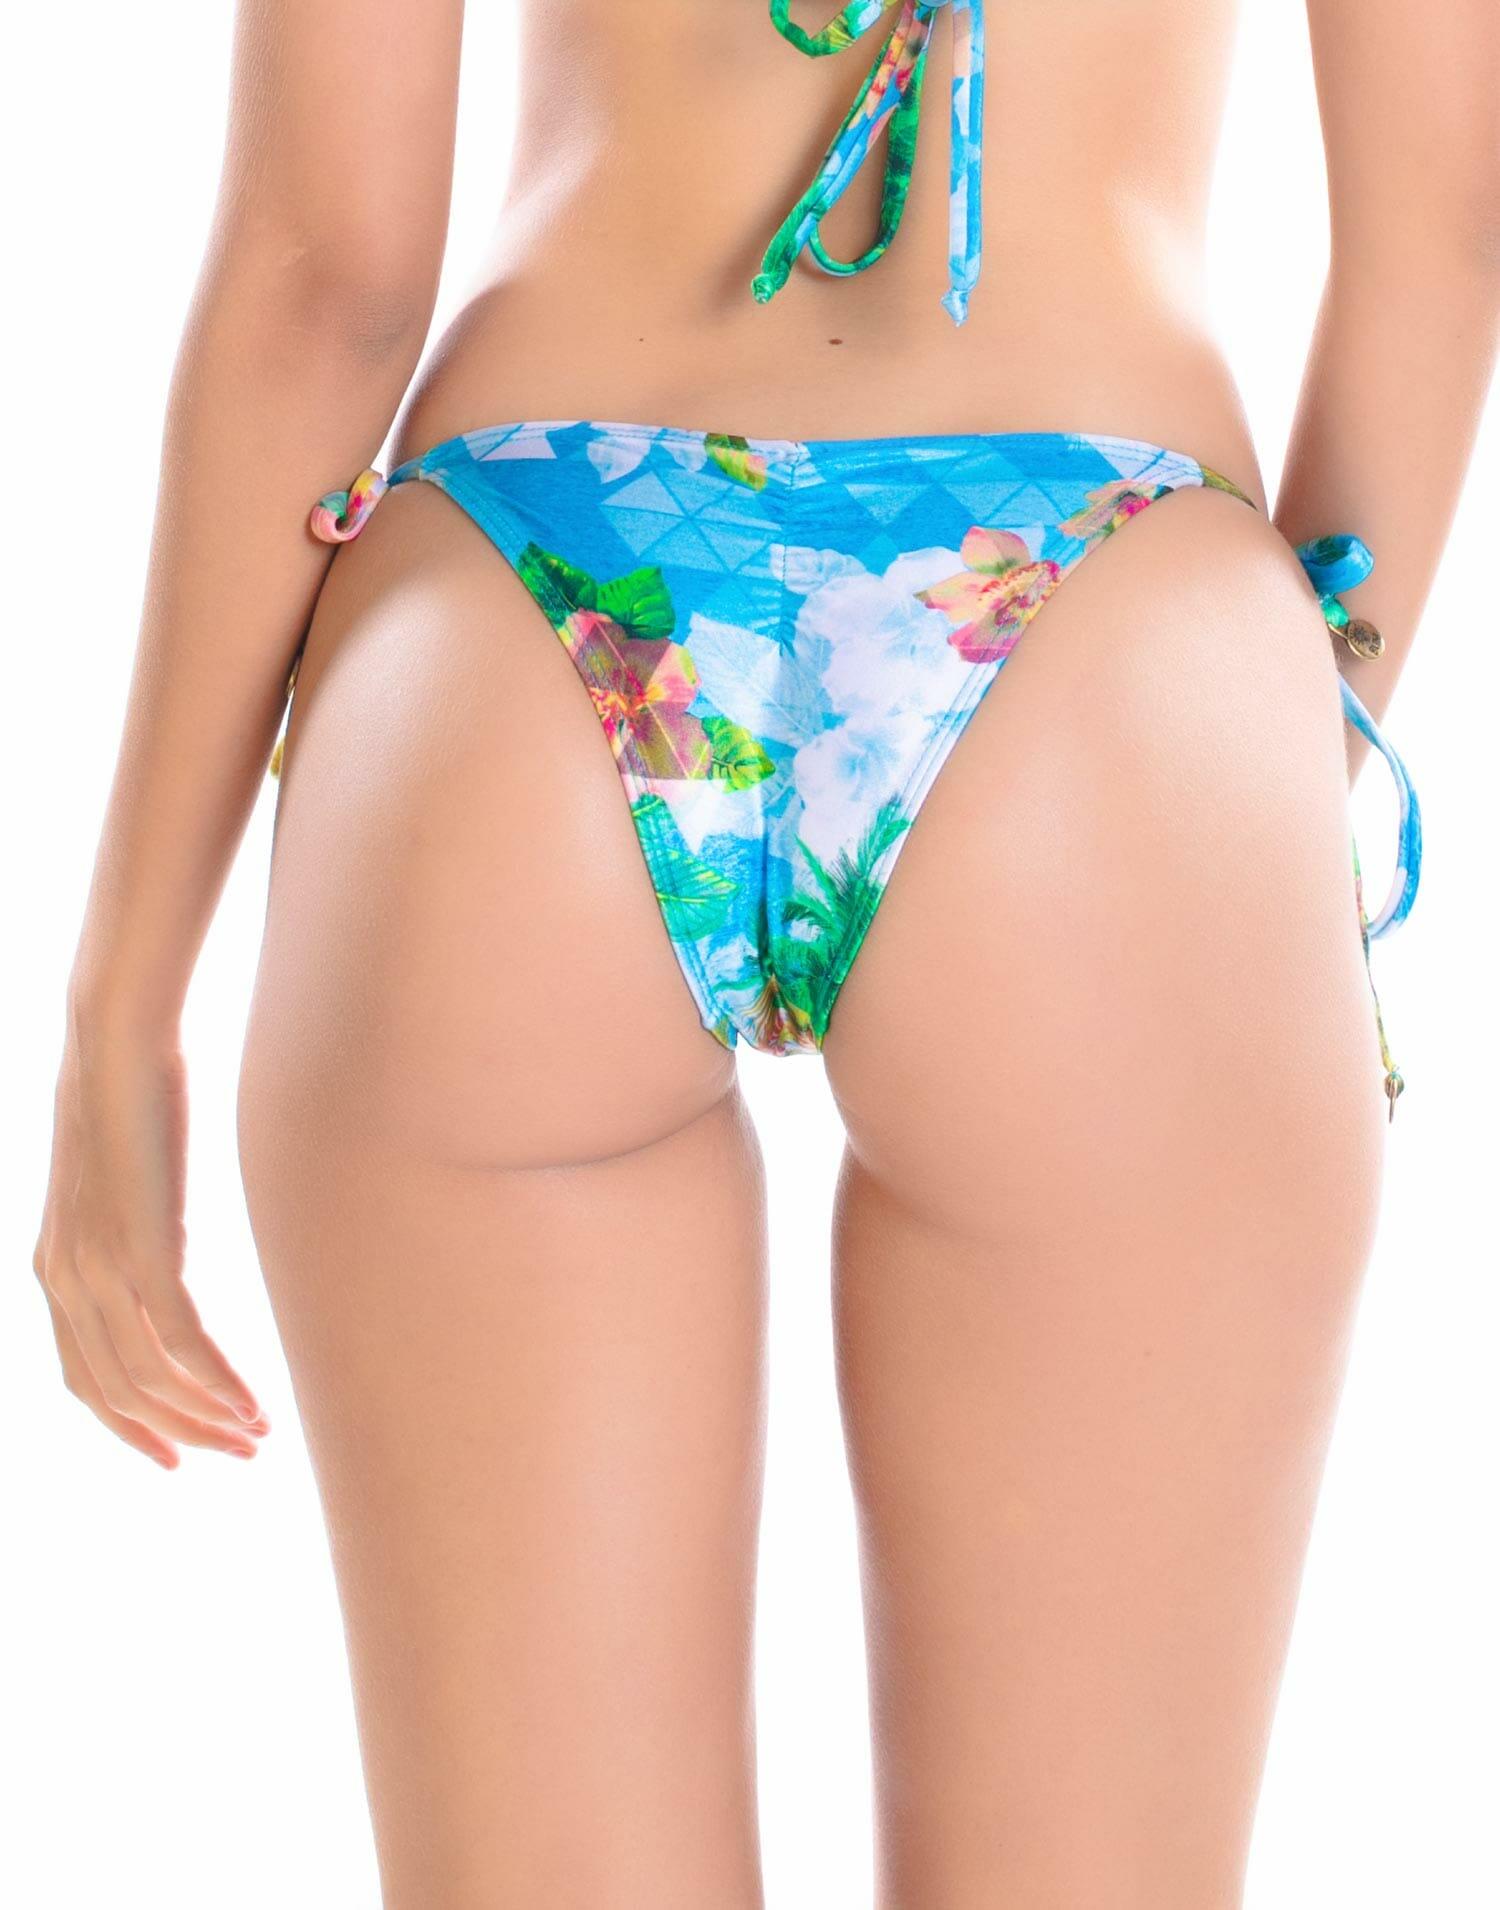 d84cc7015 Calcinha de Lacinho Caribe - Blih! Brazilian Bikini